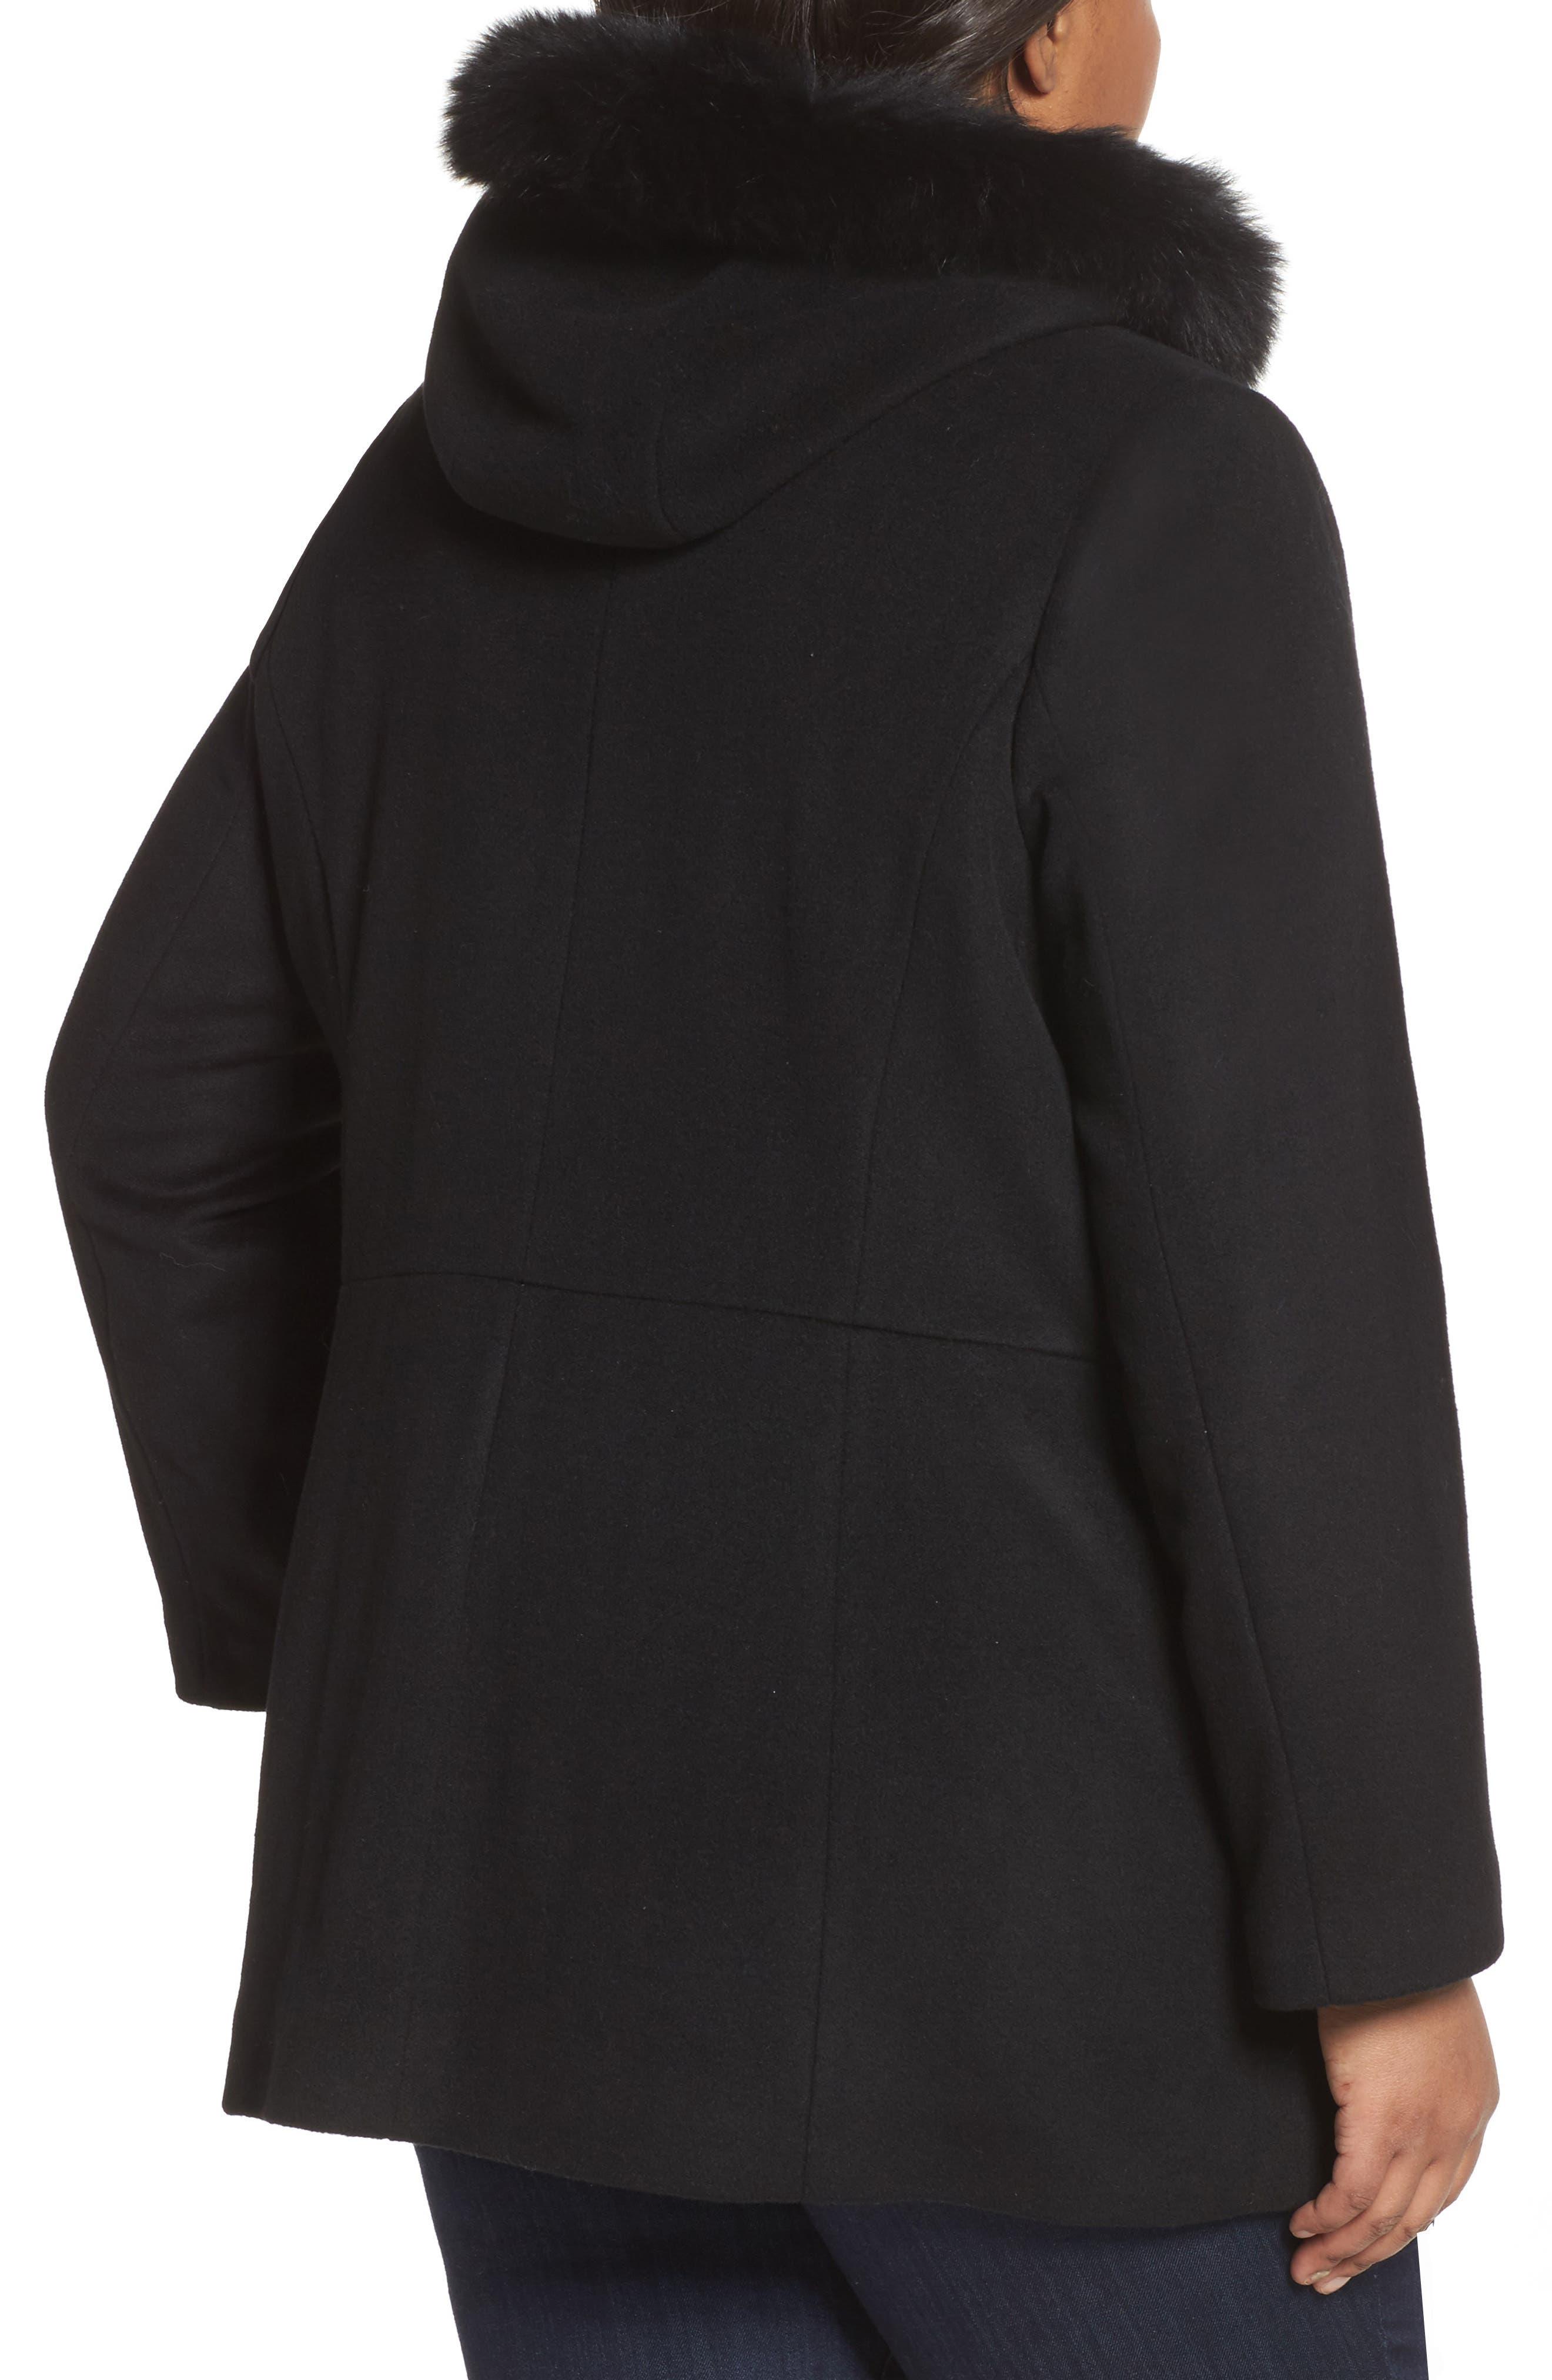 Alternate Image 2  - Sachi Genuine Fox Fur Trim Hooded Wool Blend Jacket (Plus Size)